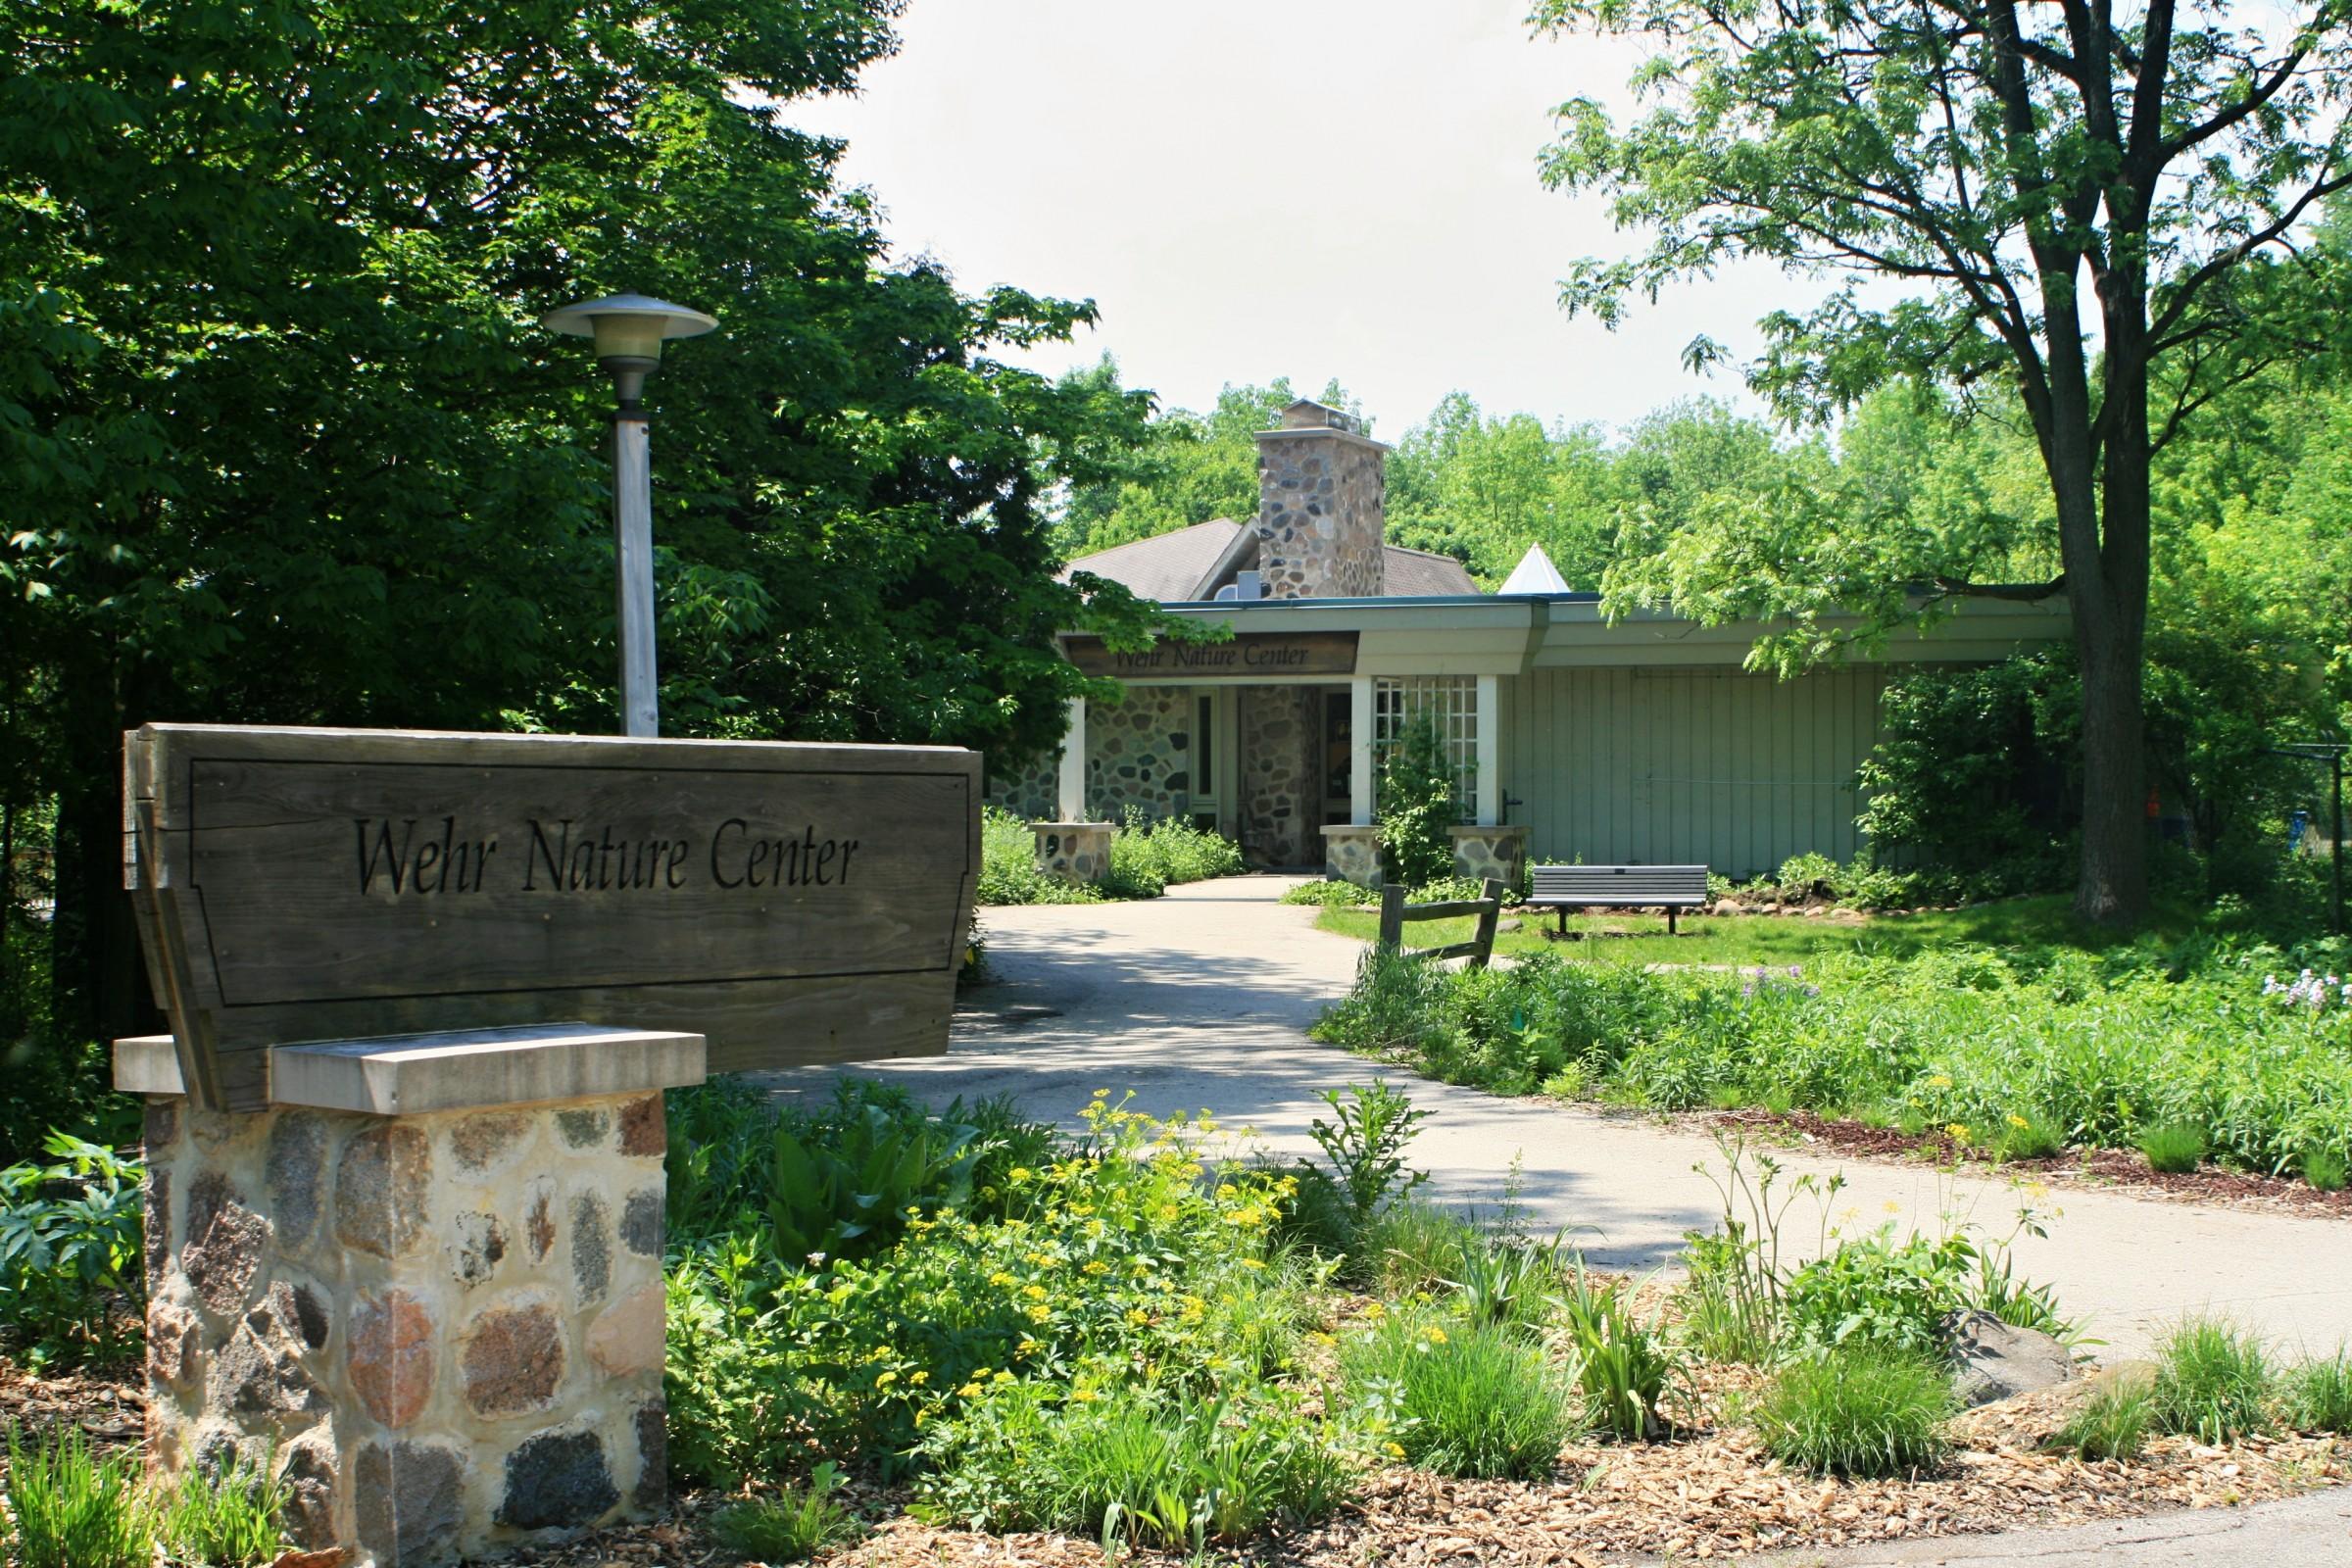 Natural Science Center Park